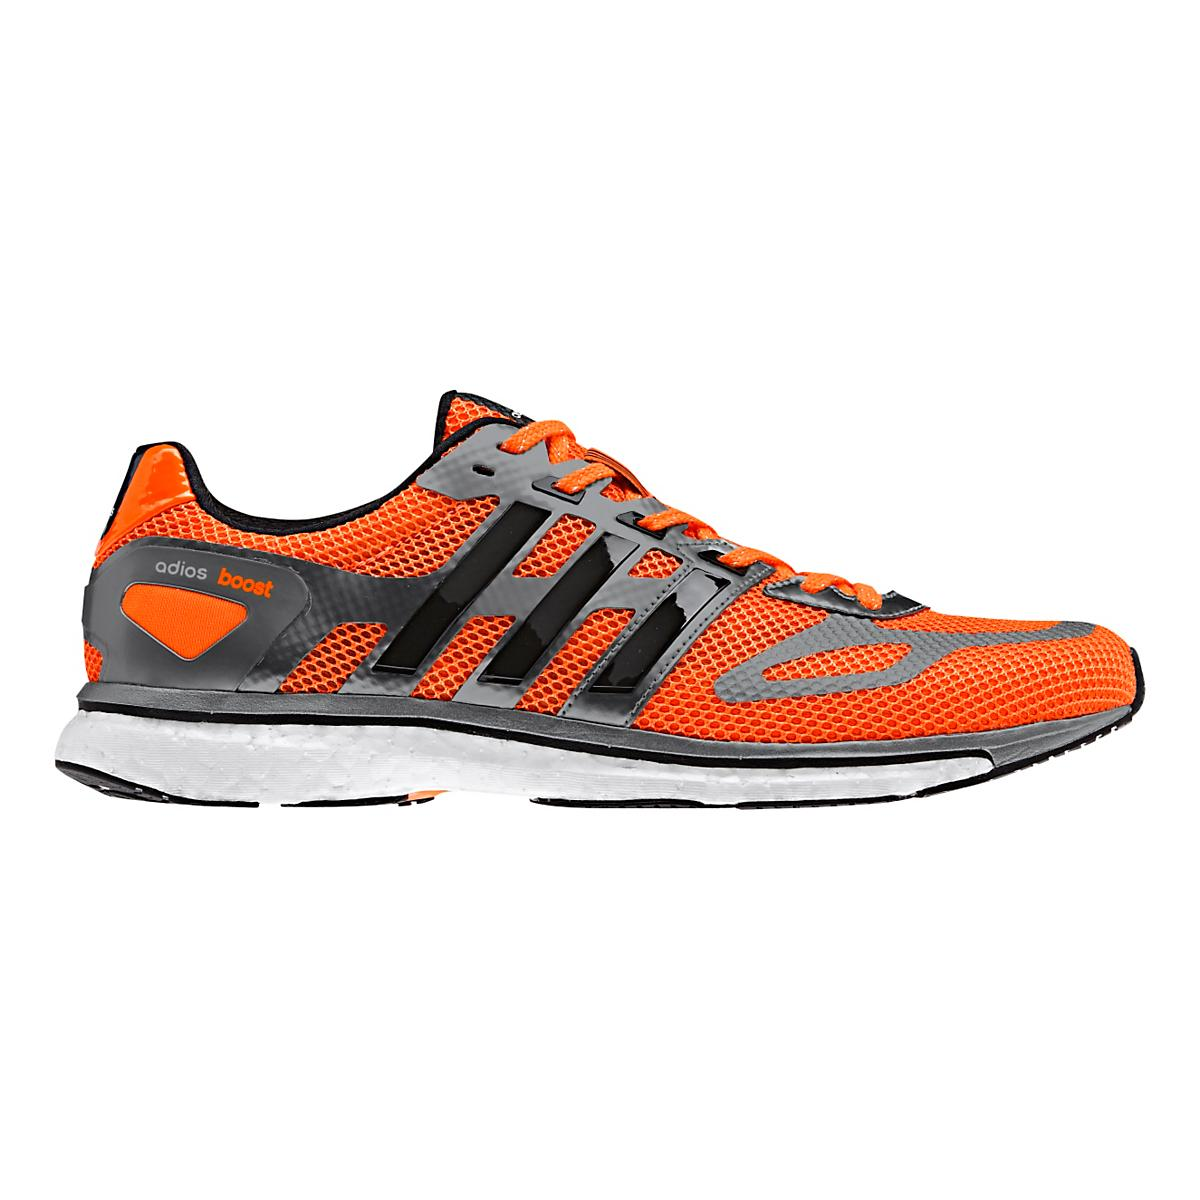 separation shoes 3bfaf 920b5 Mens adidas adizero Adios Boost Running Shoe at Road Runner Sports